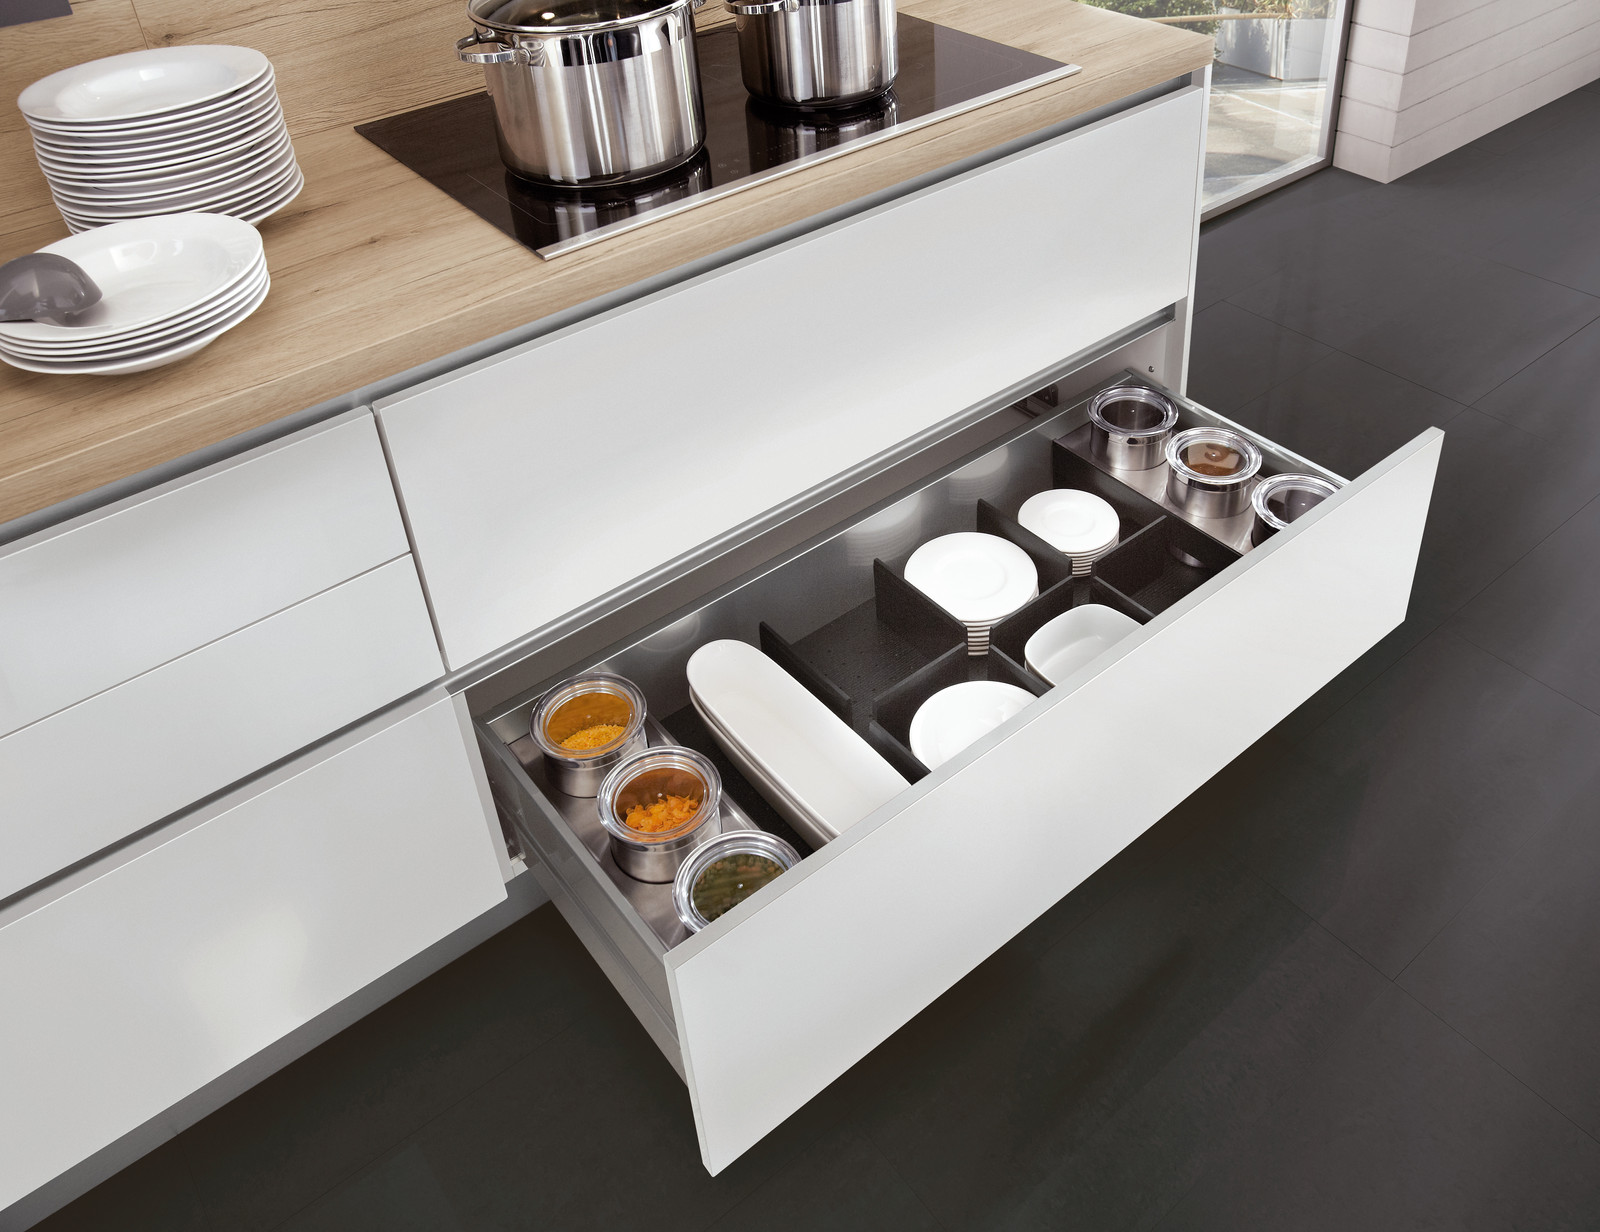 Kitchen Cabinets Houston Katy | European Kitchen | USA | Europa ...